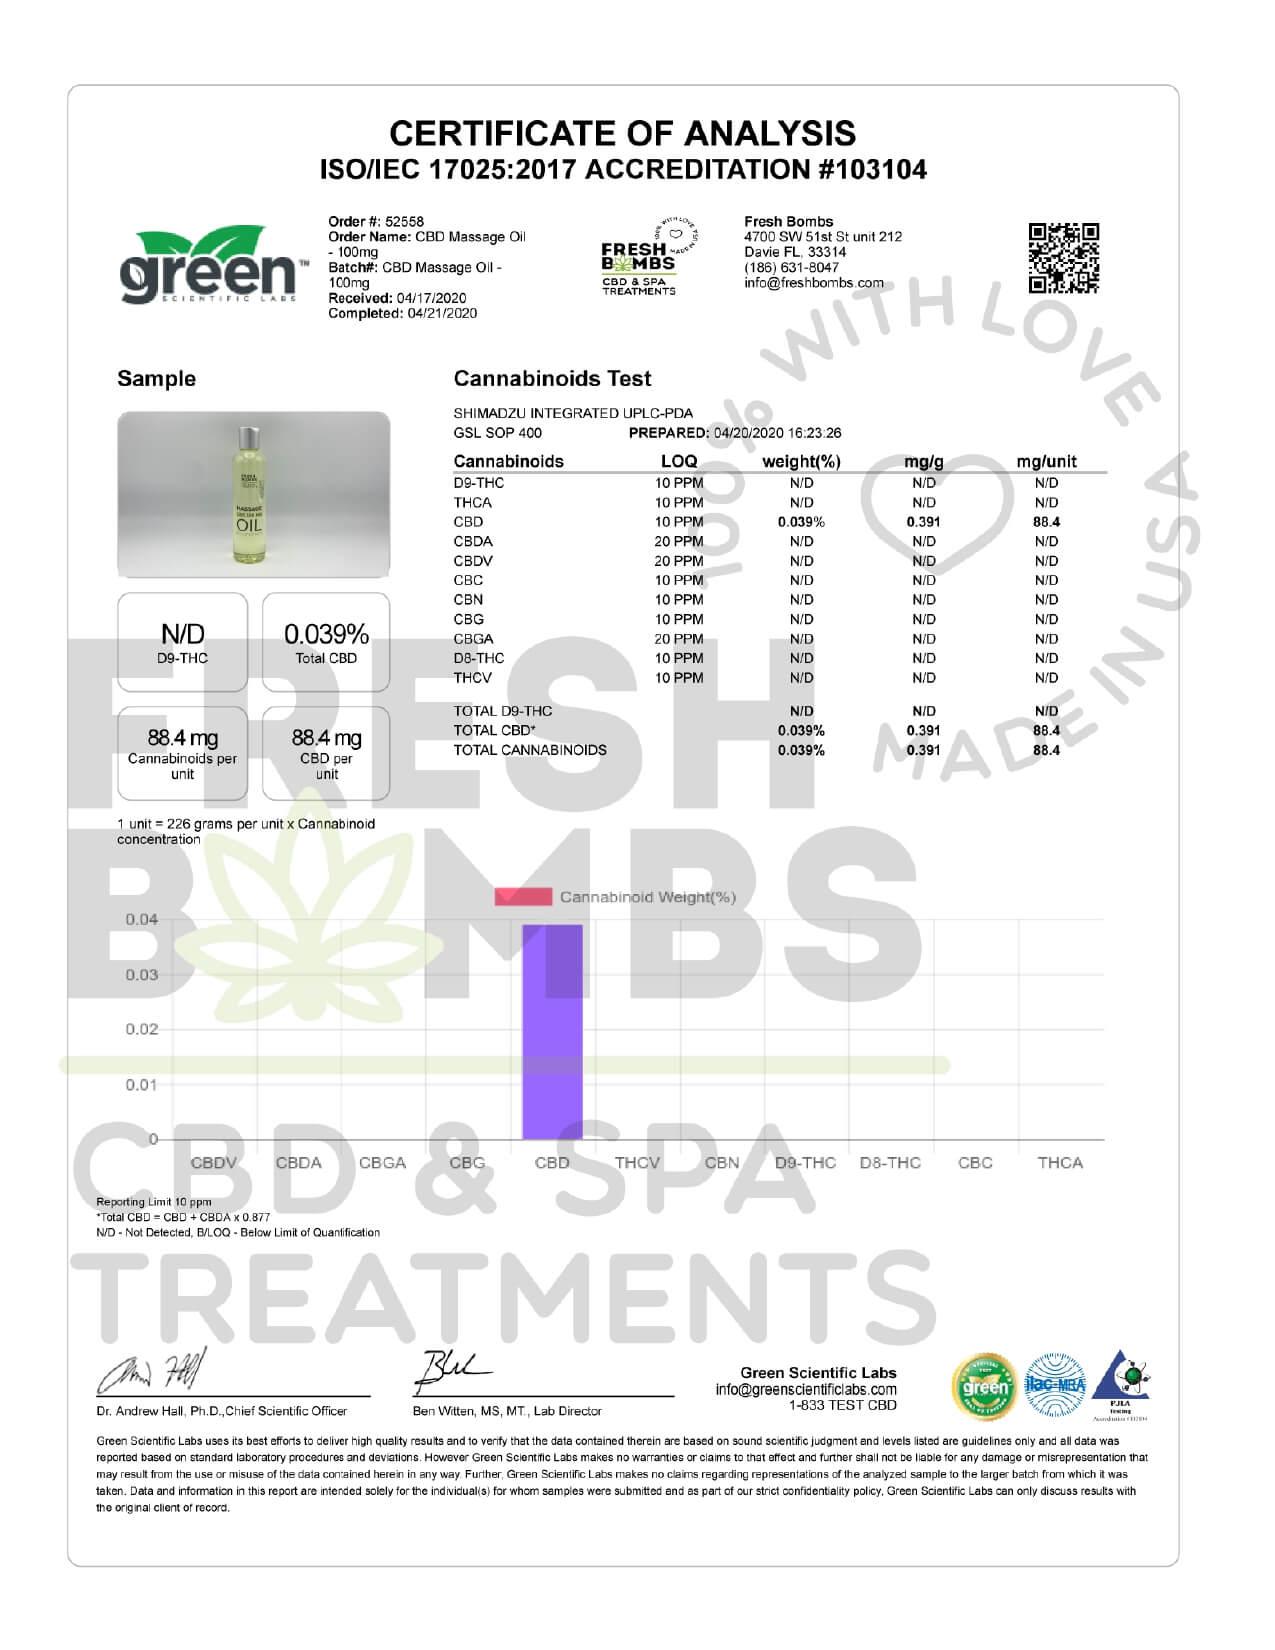 Fresh Bombs CBD Topical Full Spectrum Massage Oil Lab Report